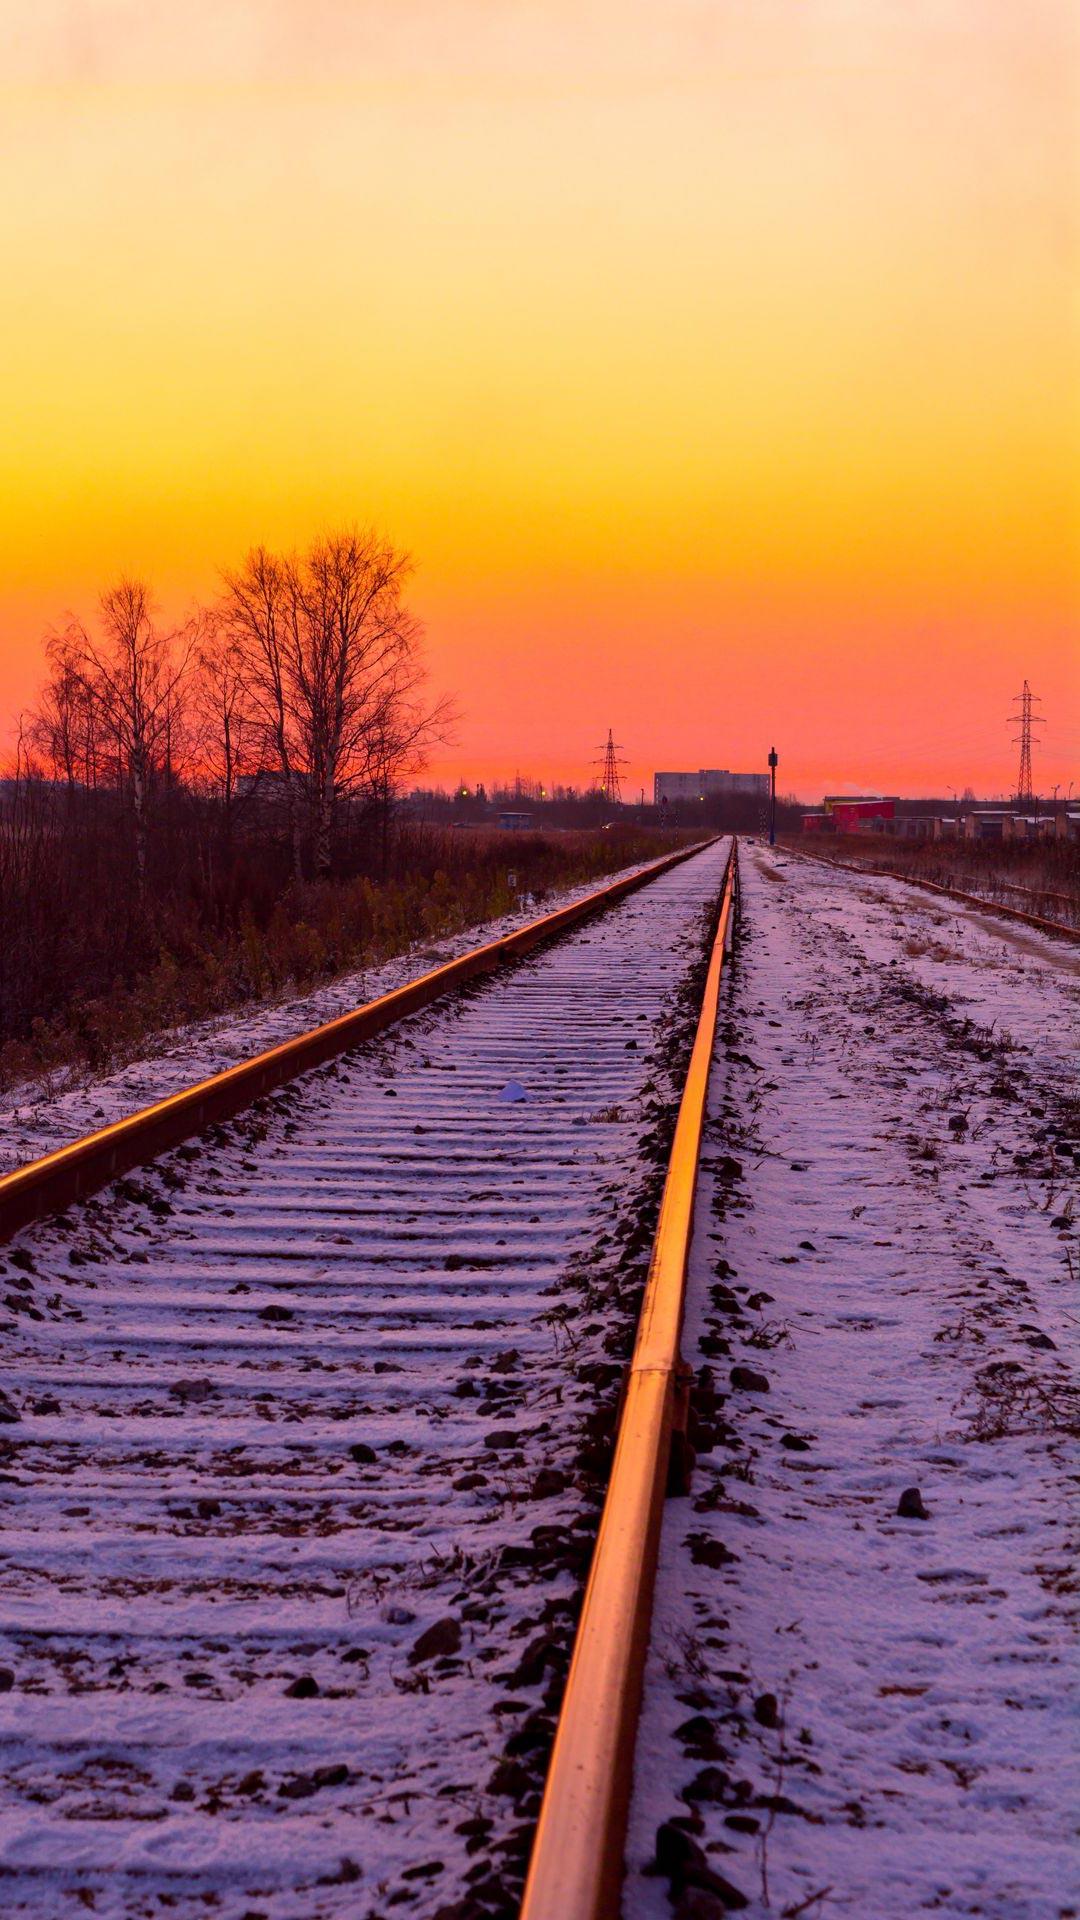 Sunset Railroad Tracks Wallpaper + Wallpapers Download 2021